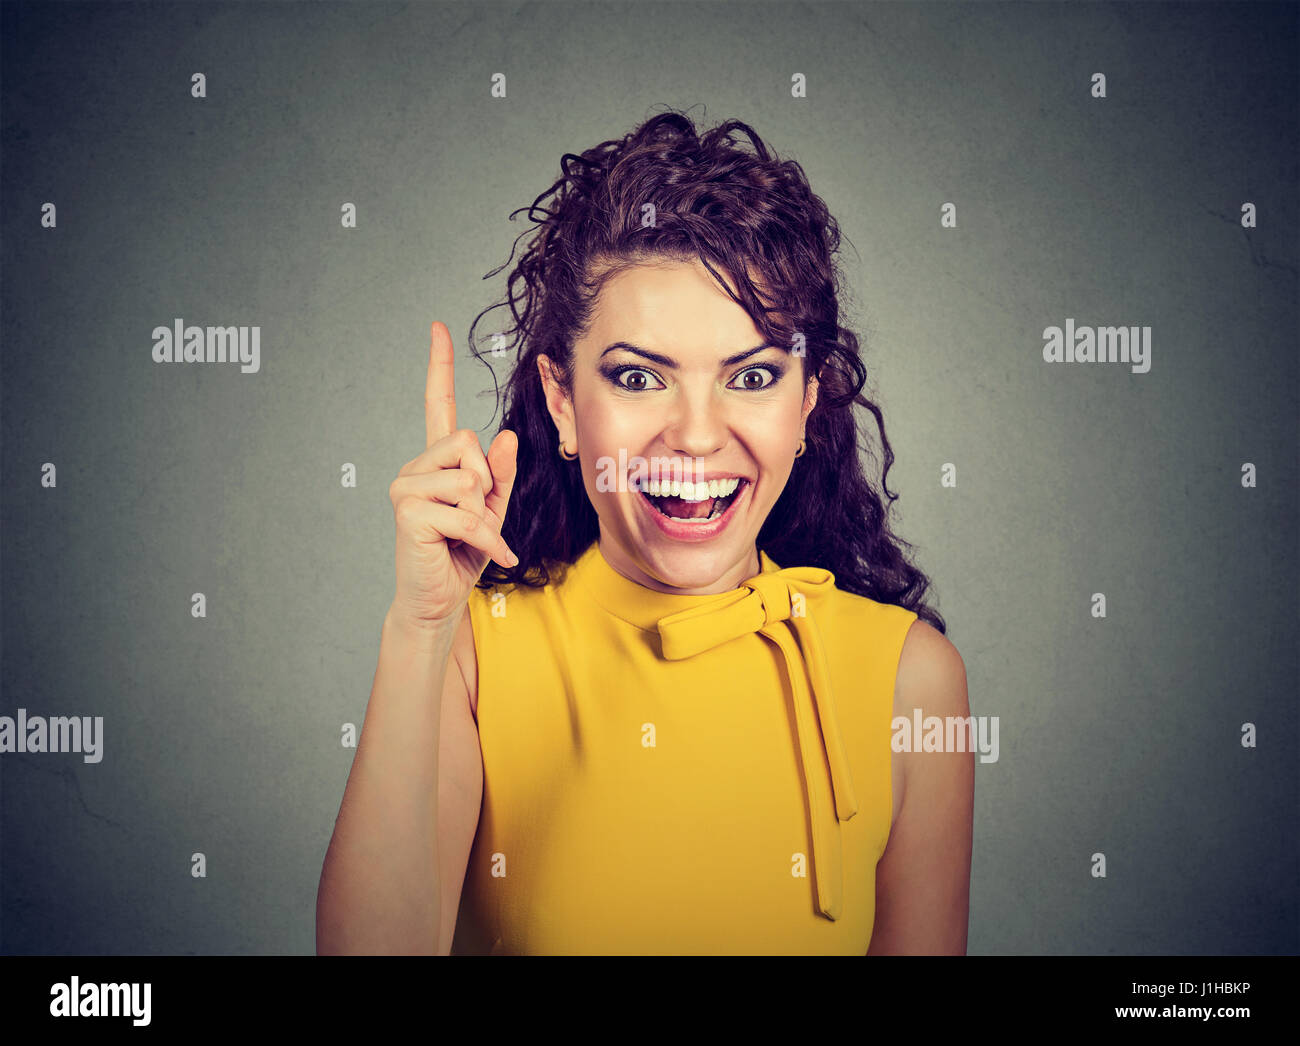 Attraktive Frau Finger oben hat eine Idee Stockbild